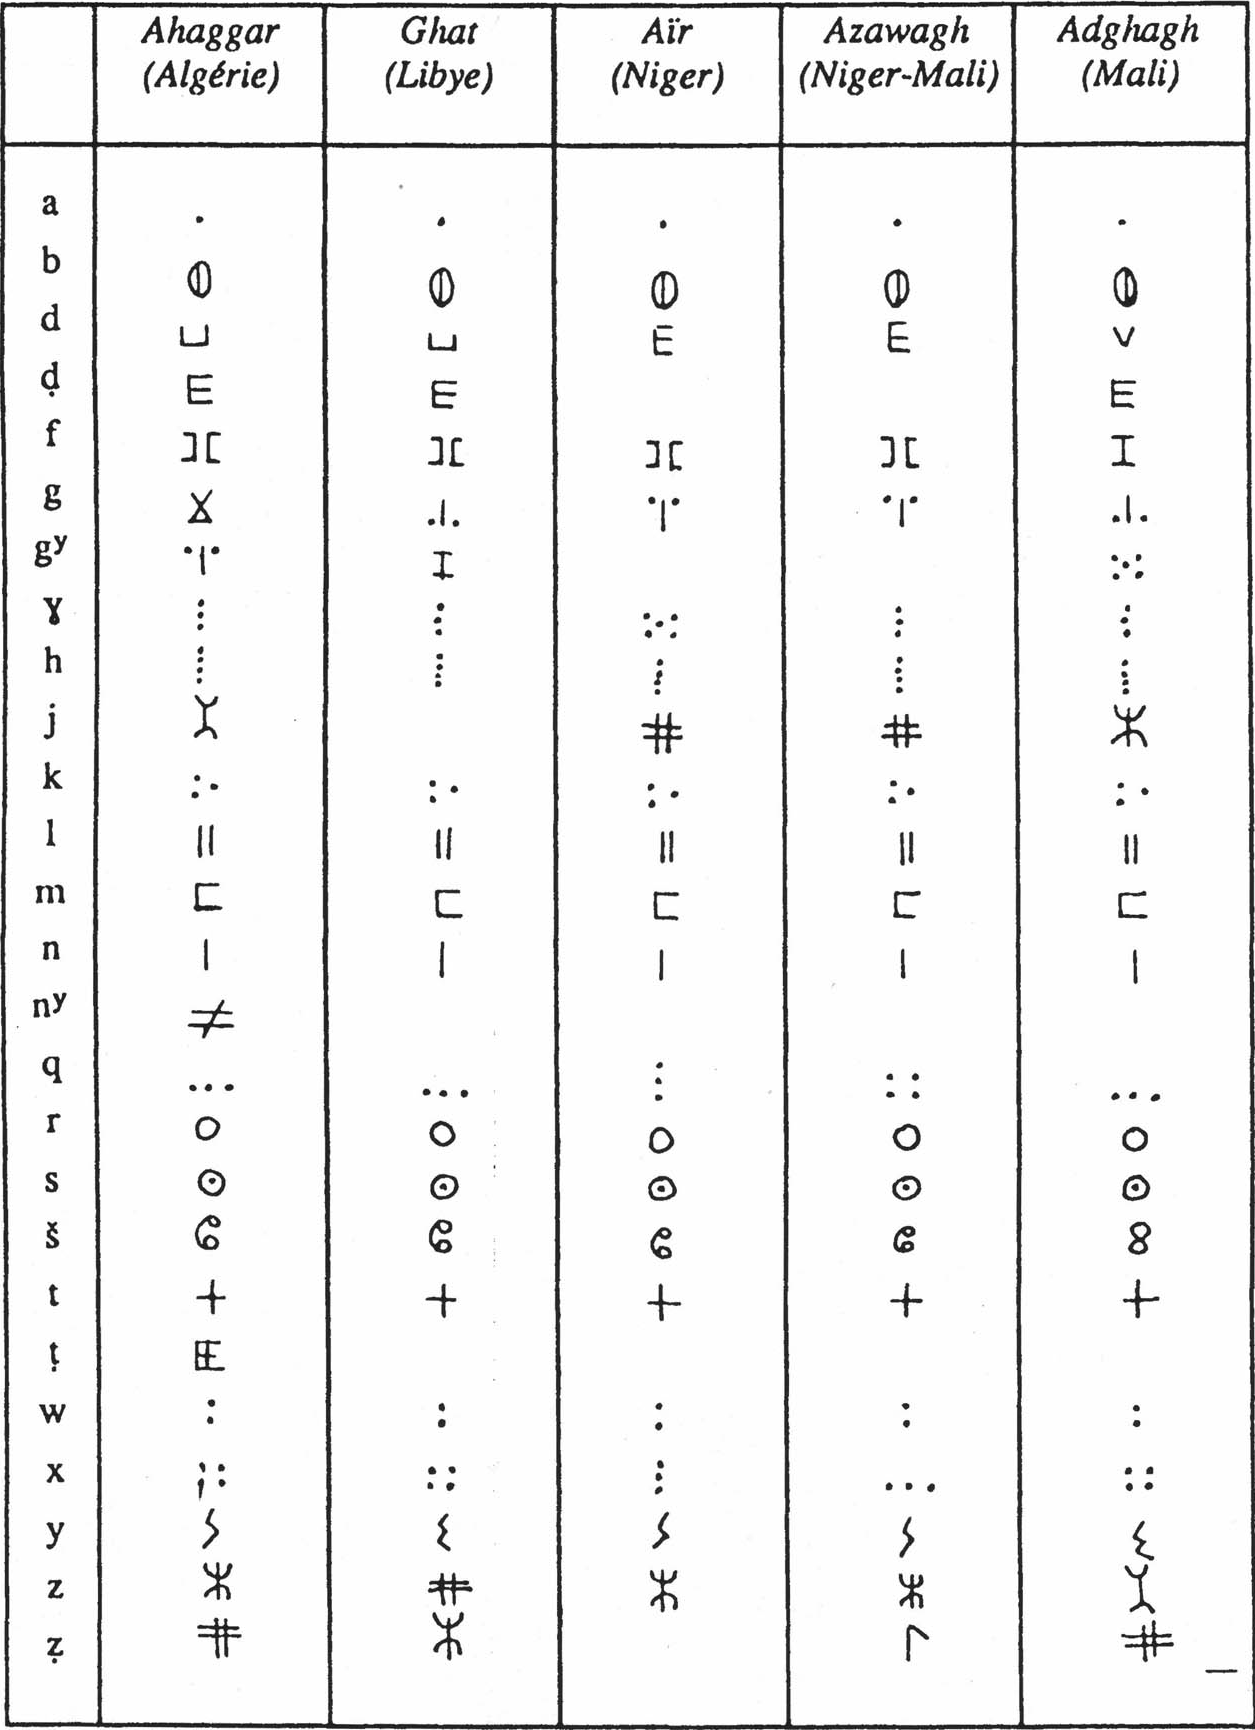 Connu 17 | Douiret – Eropaei - Écriture - G. Camps, H. Claudot-Hawad, S  WX15